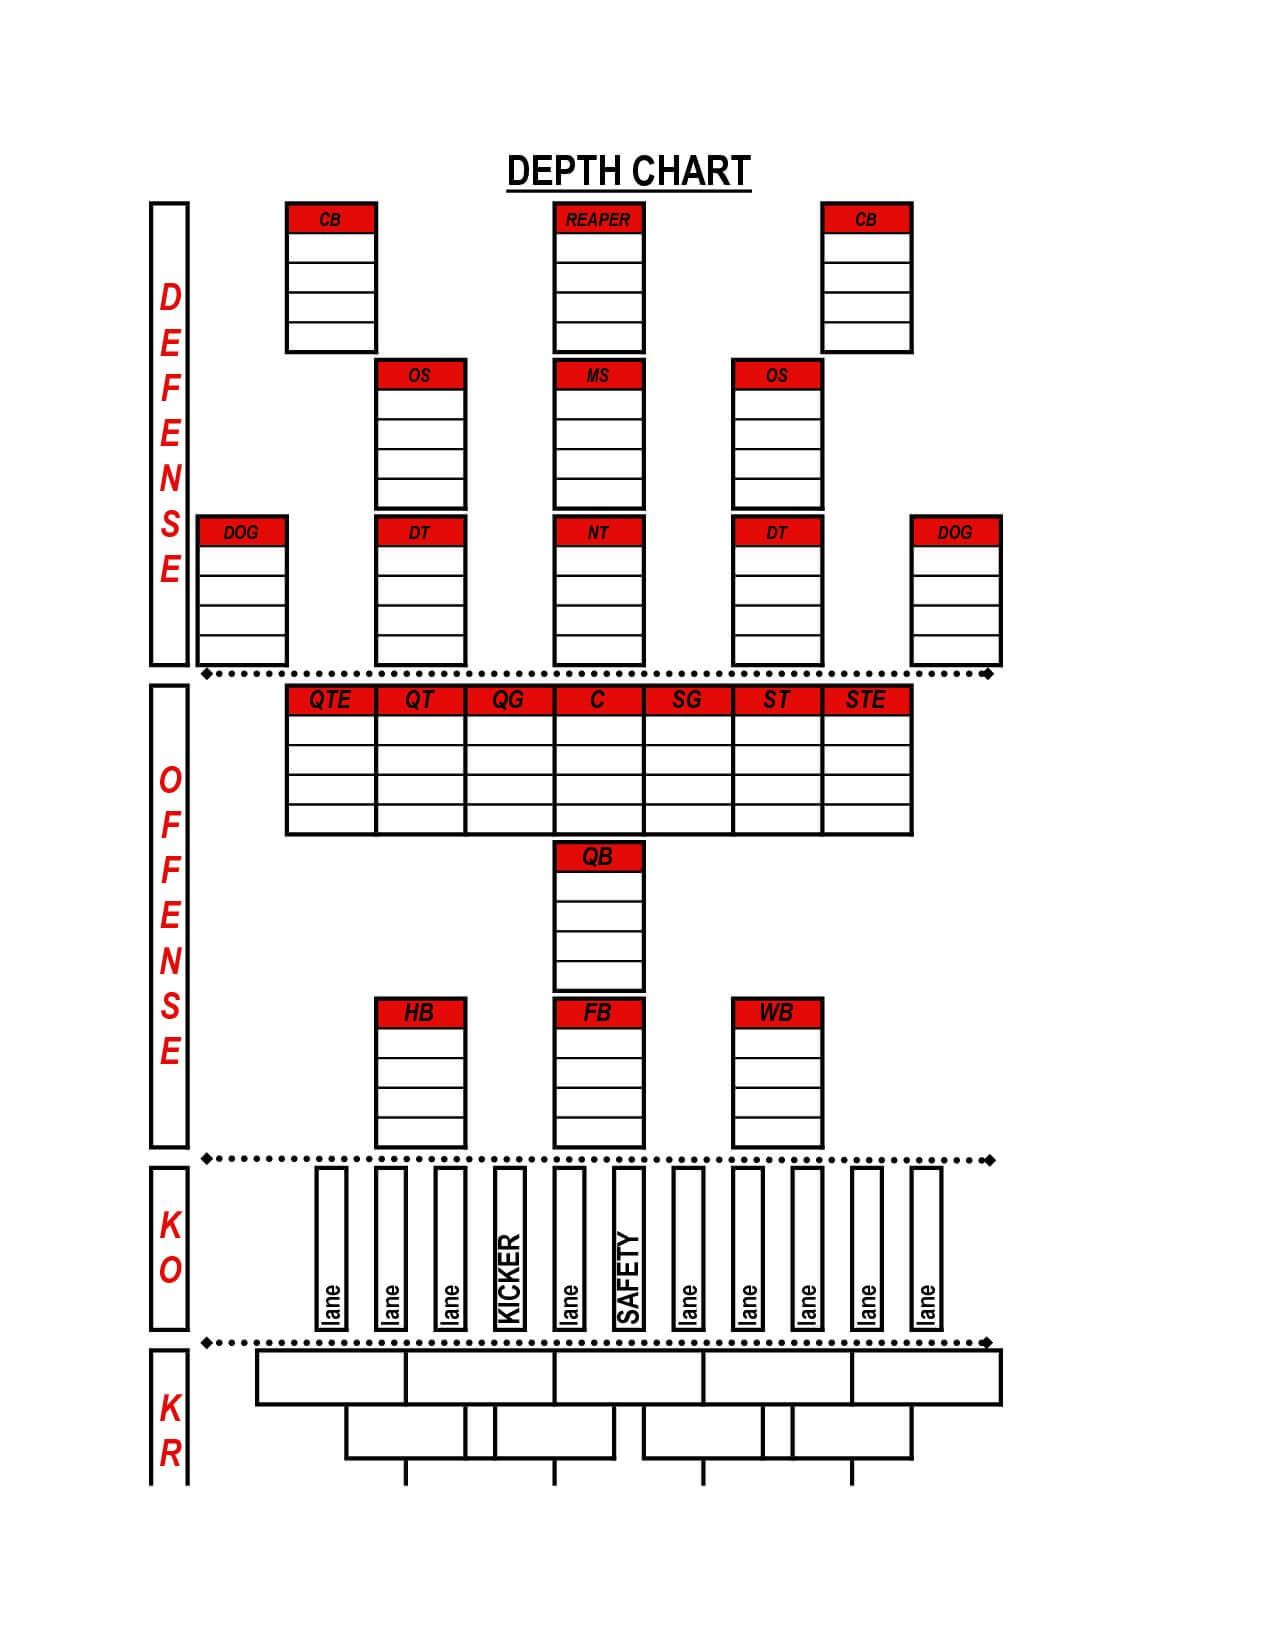 006 Blank Football Depth Chart Template Like Special Teams With Regard To Blank Football Depth Chart Template